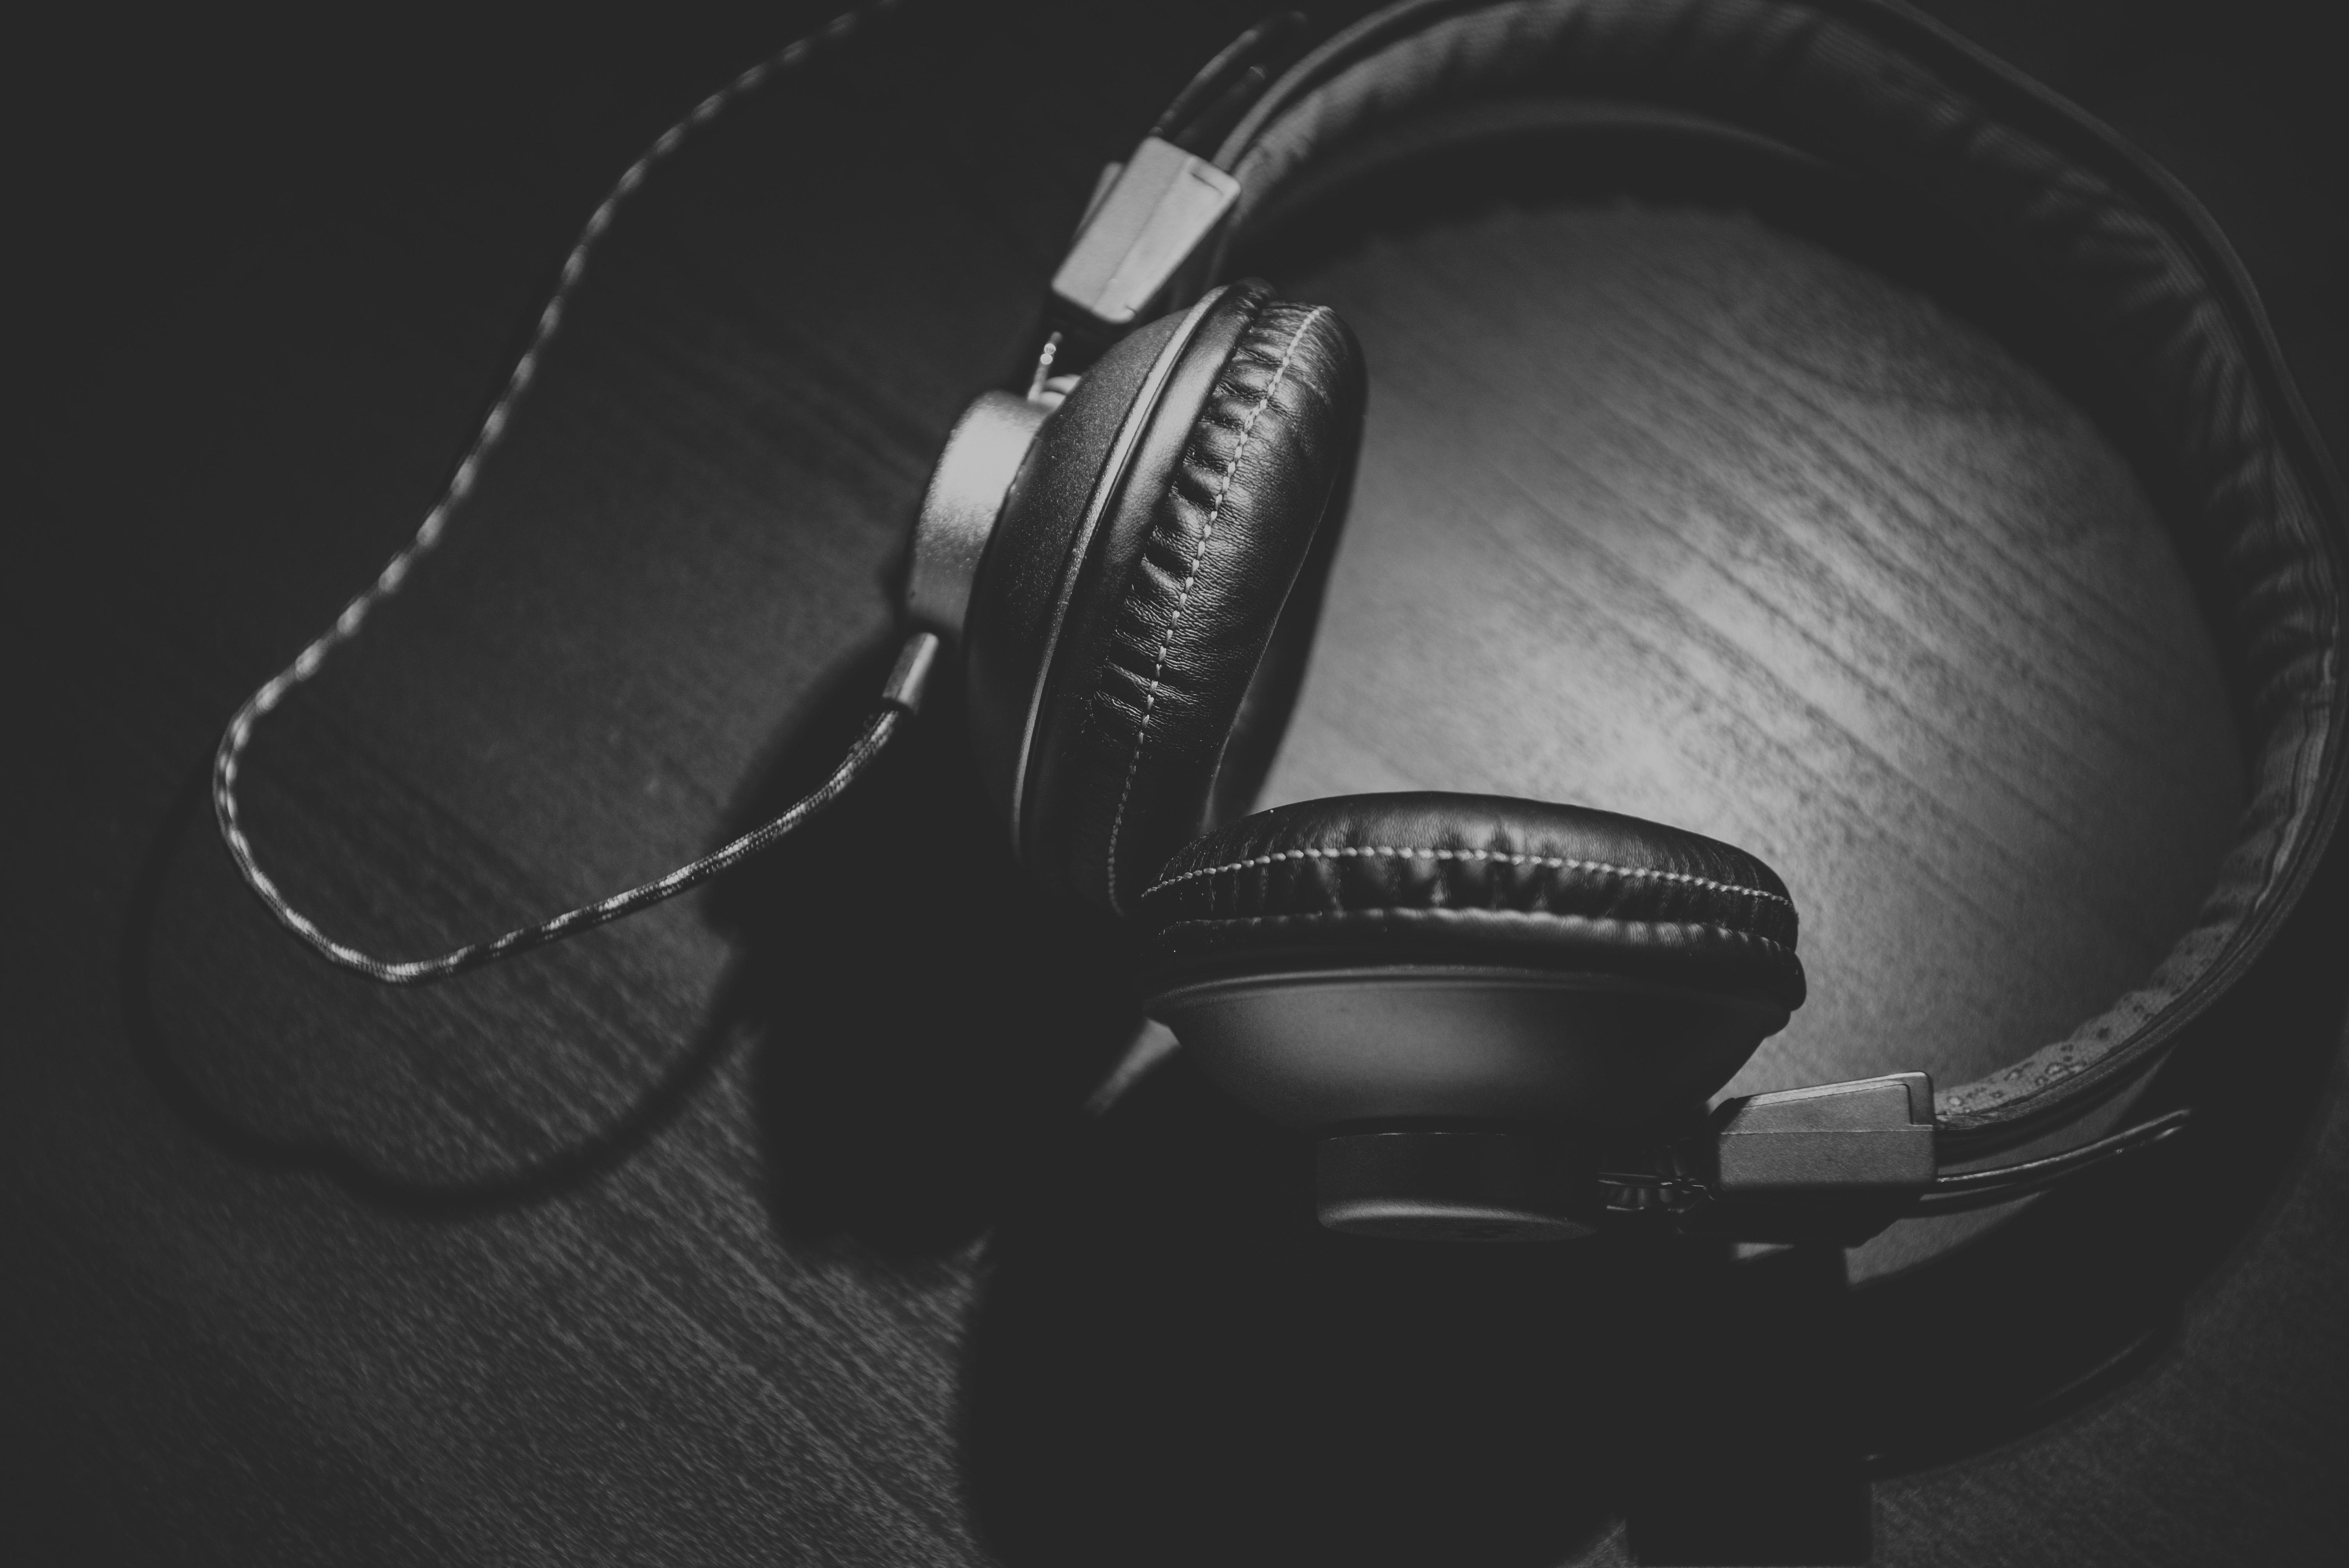 poslušanje glasbe